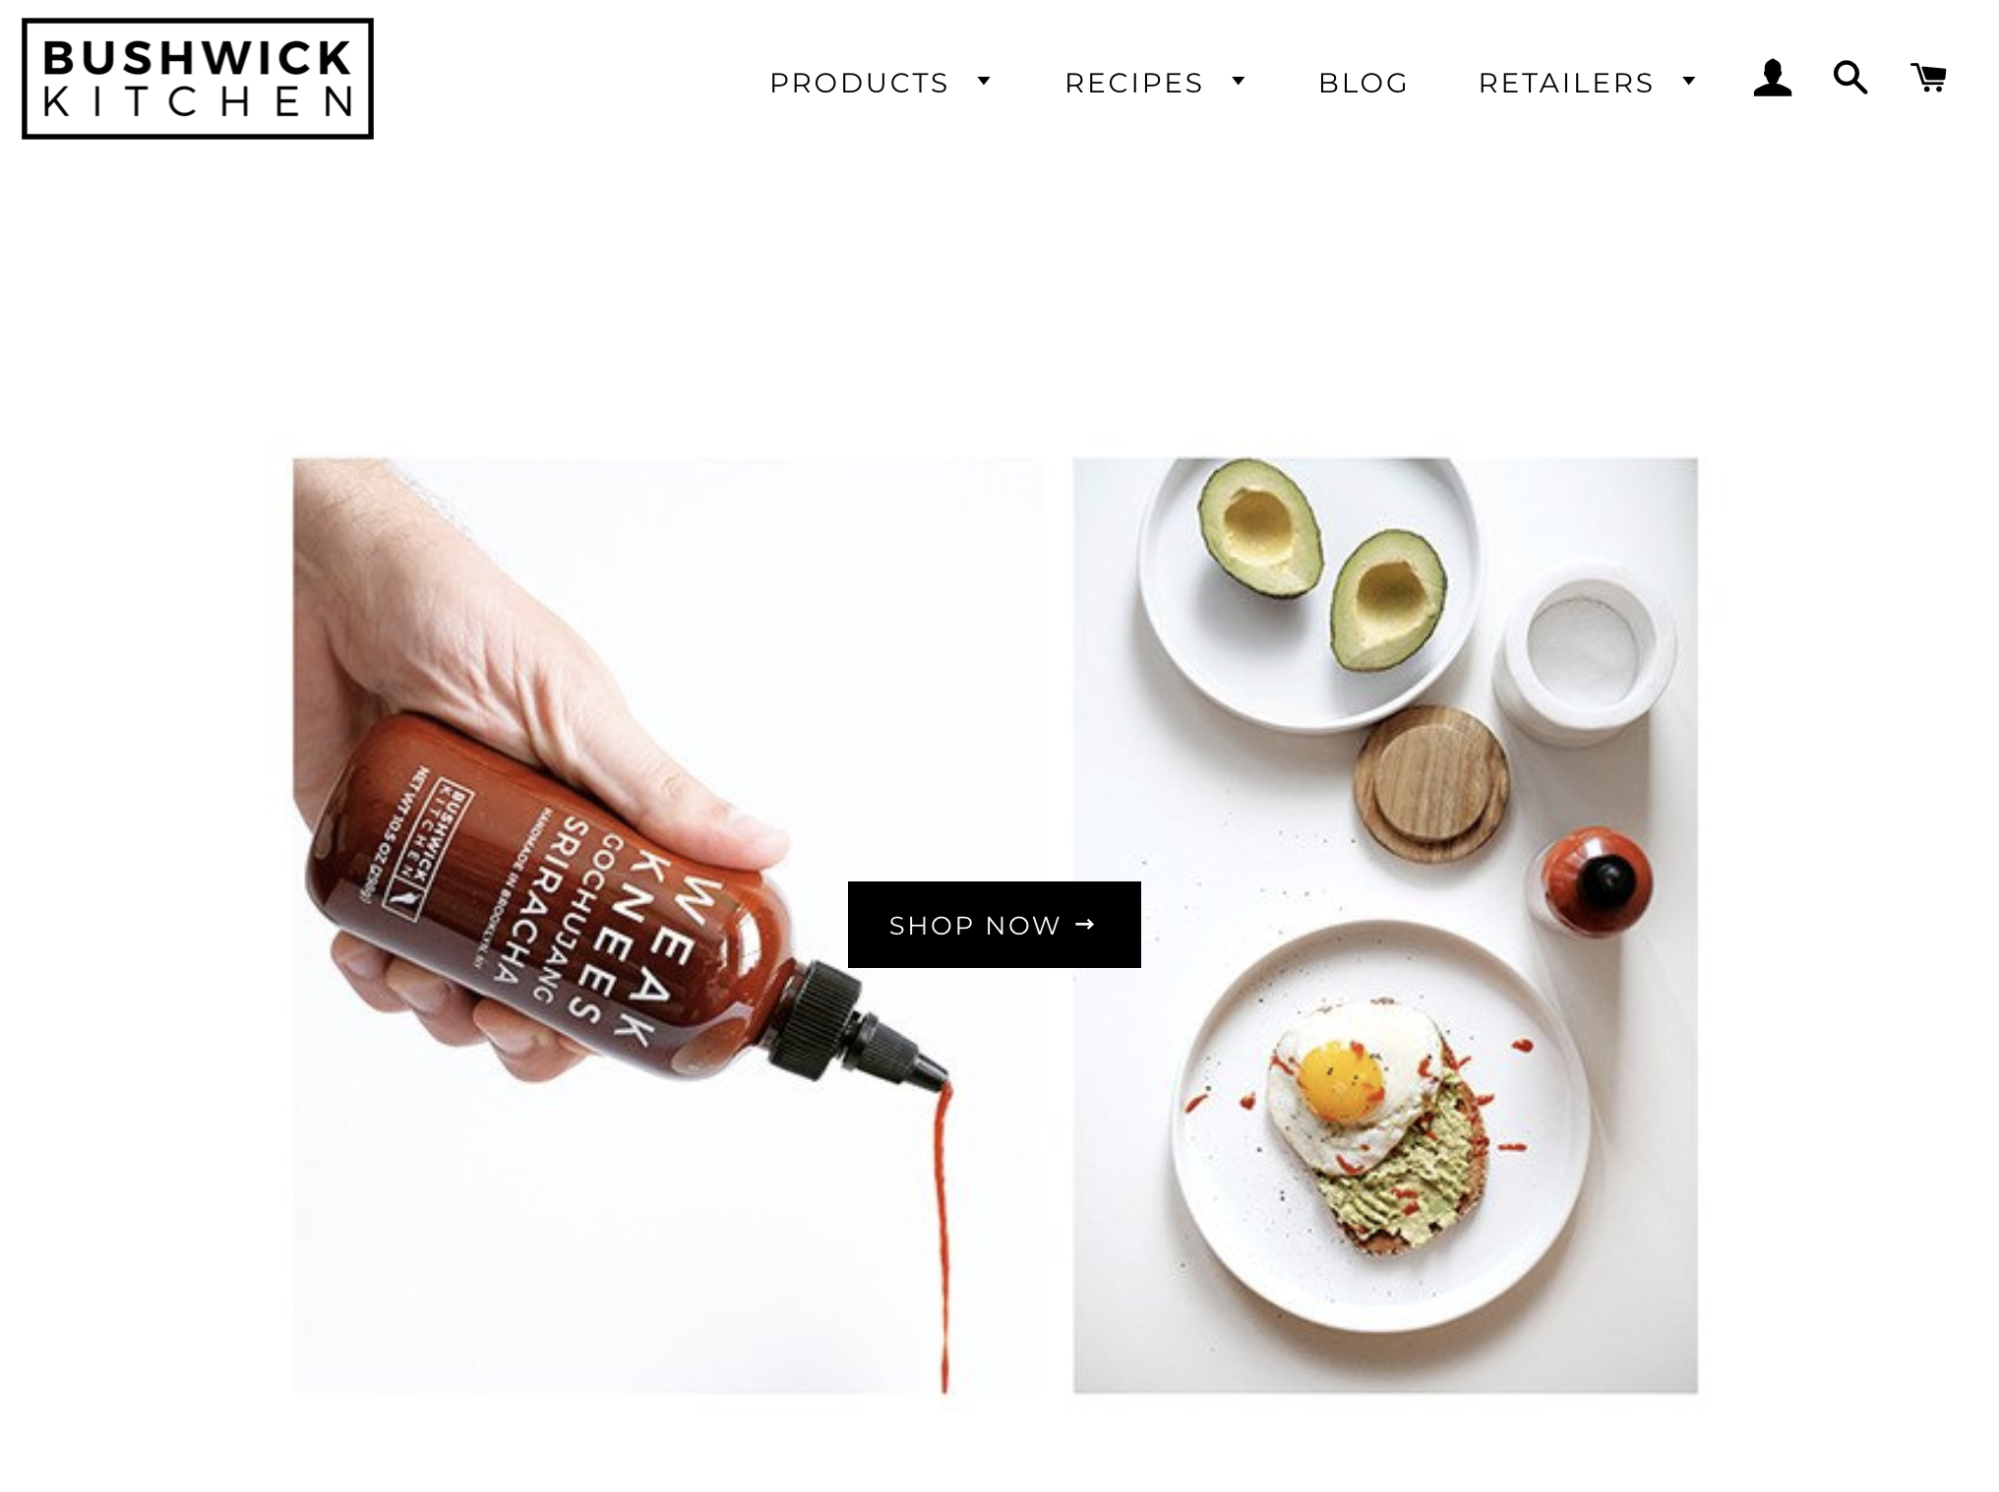 Screenshot showing landing page on bushwick kitchen